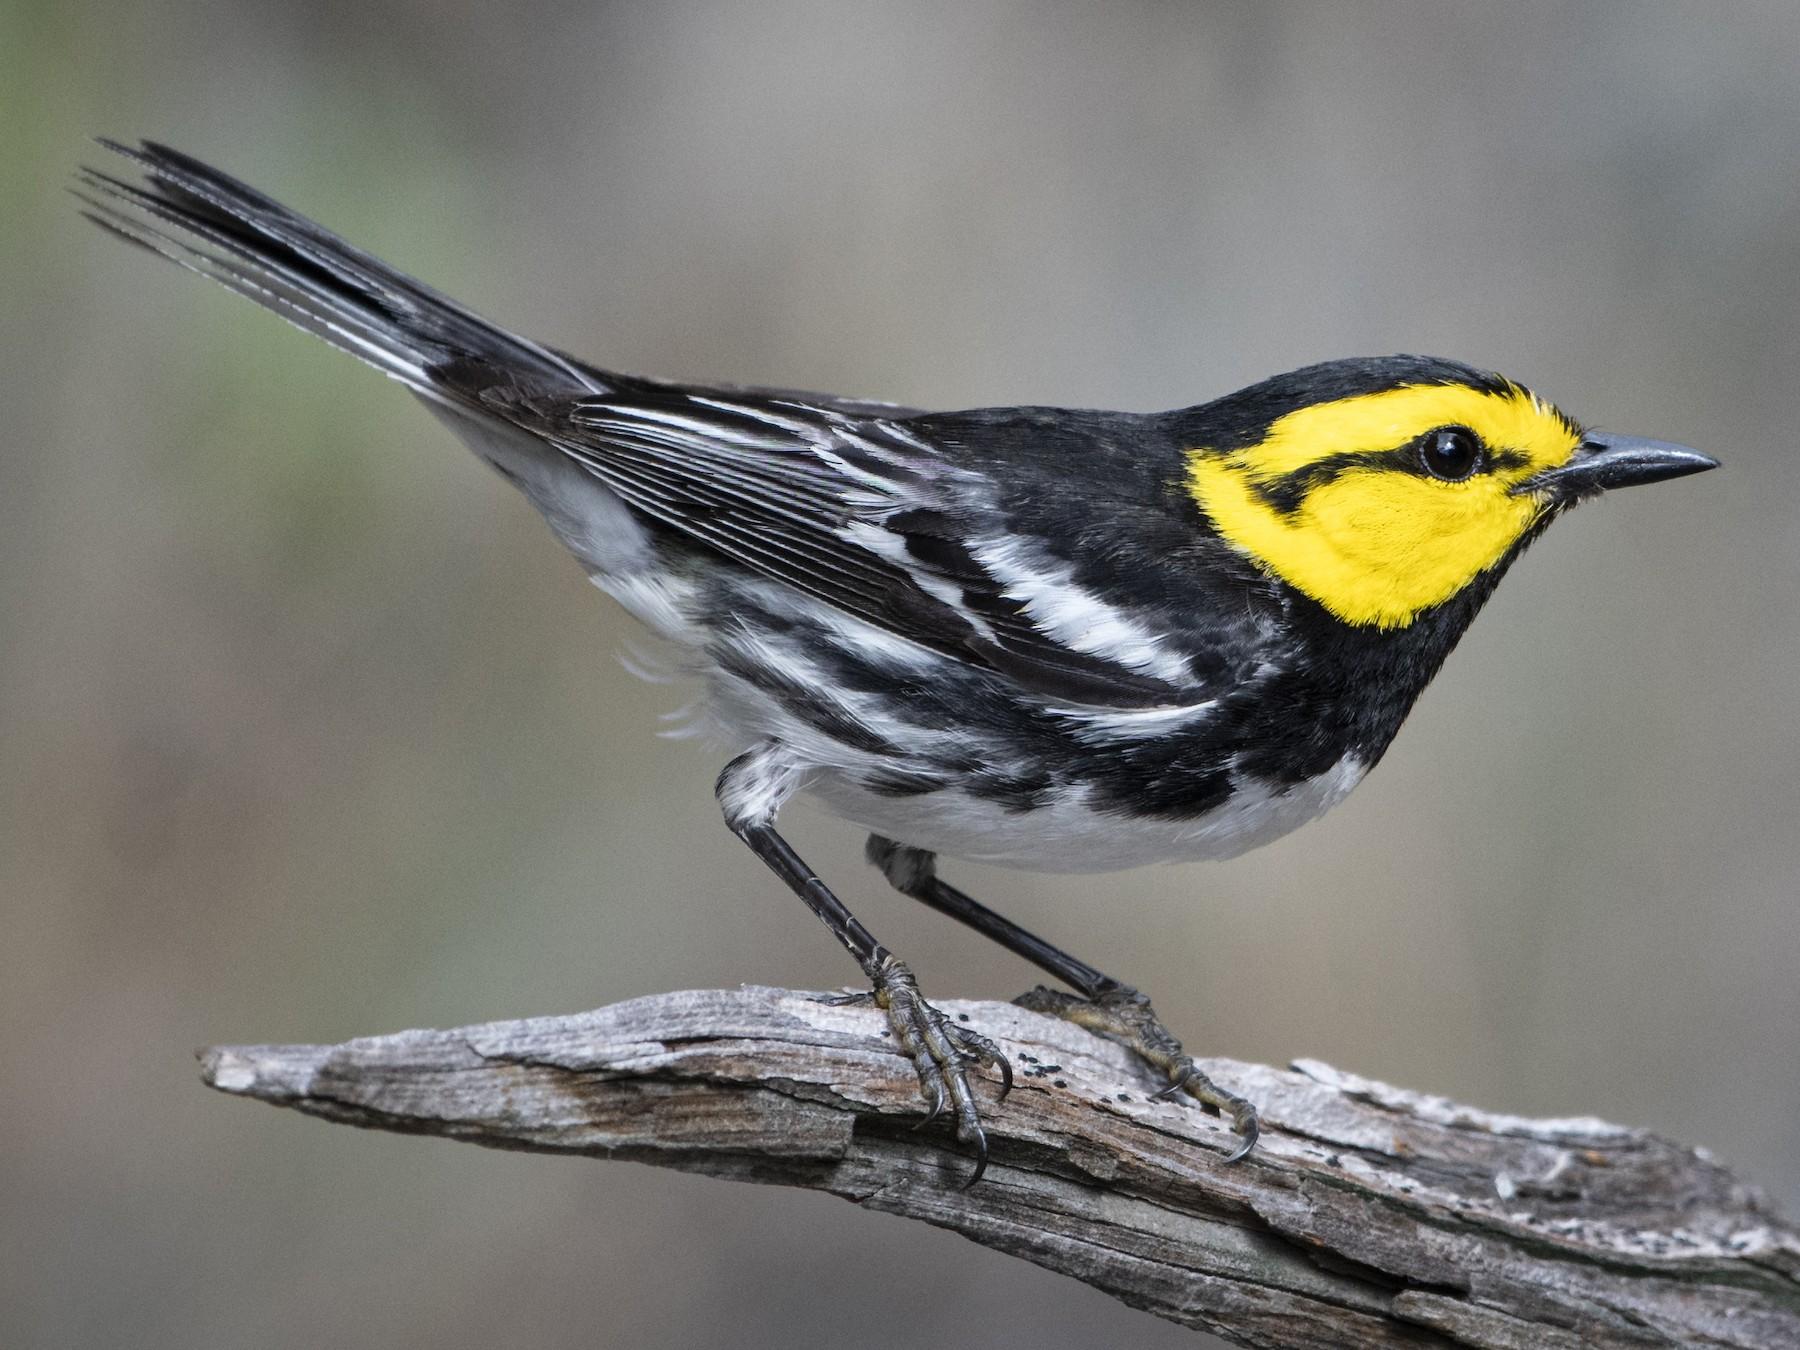 Golden-cheeked Warbler - Bryan Calk